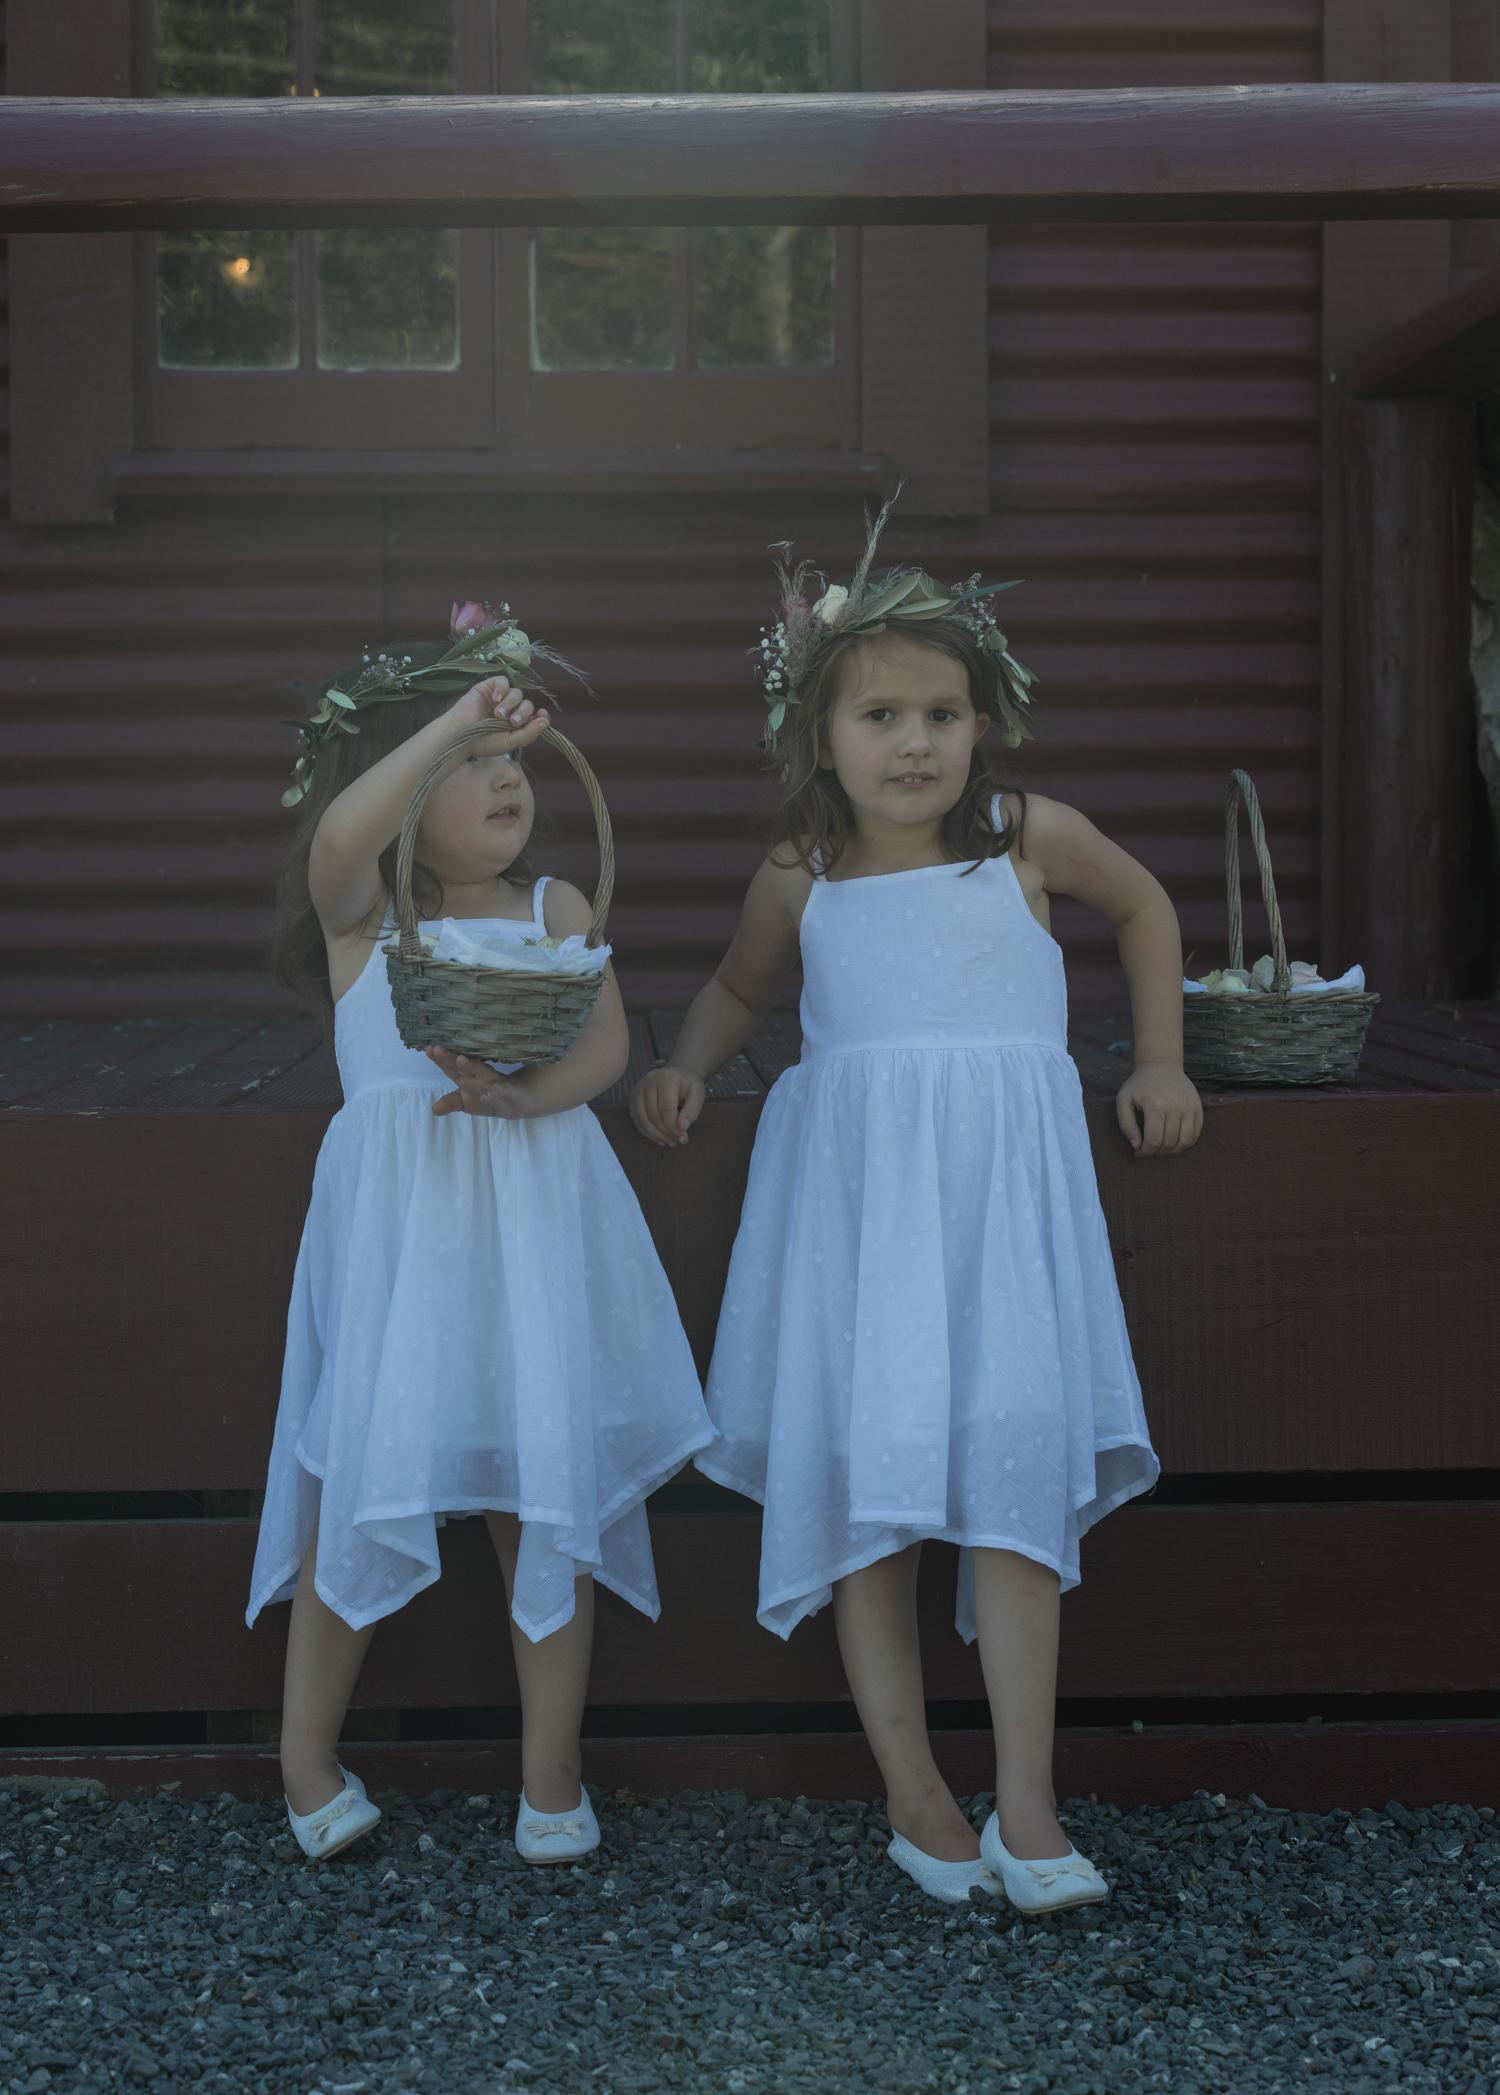 wedding-at-the-red-barn-new-zealand-wedding-photographer-flower-girls-playing.jpg